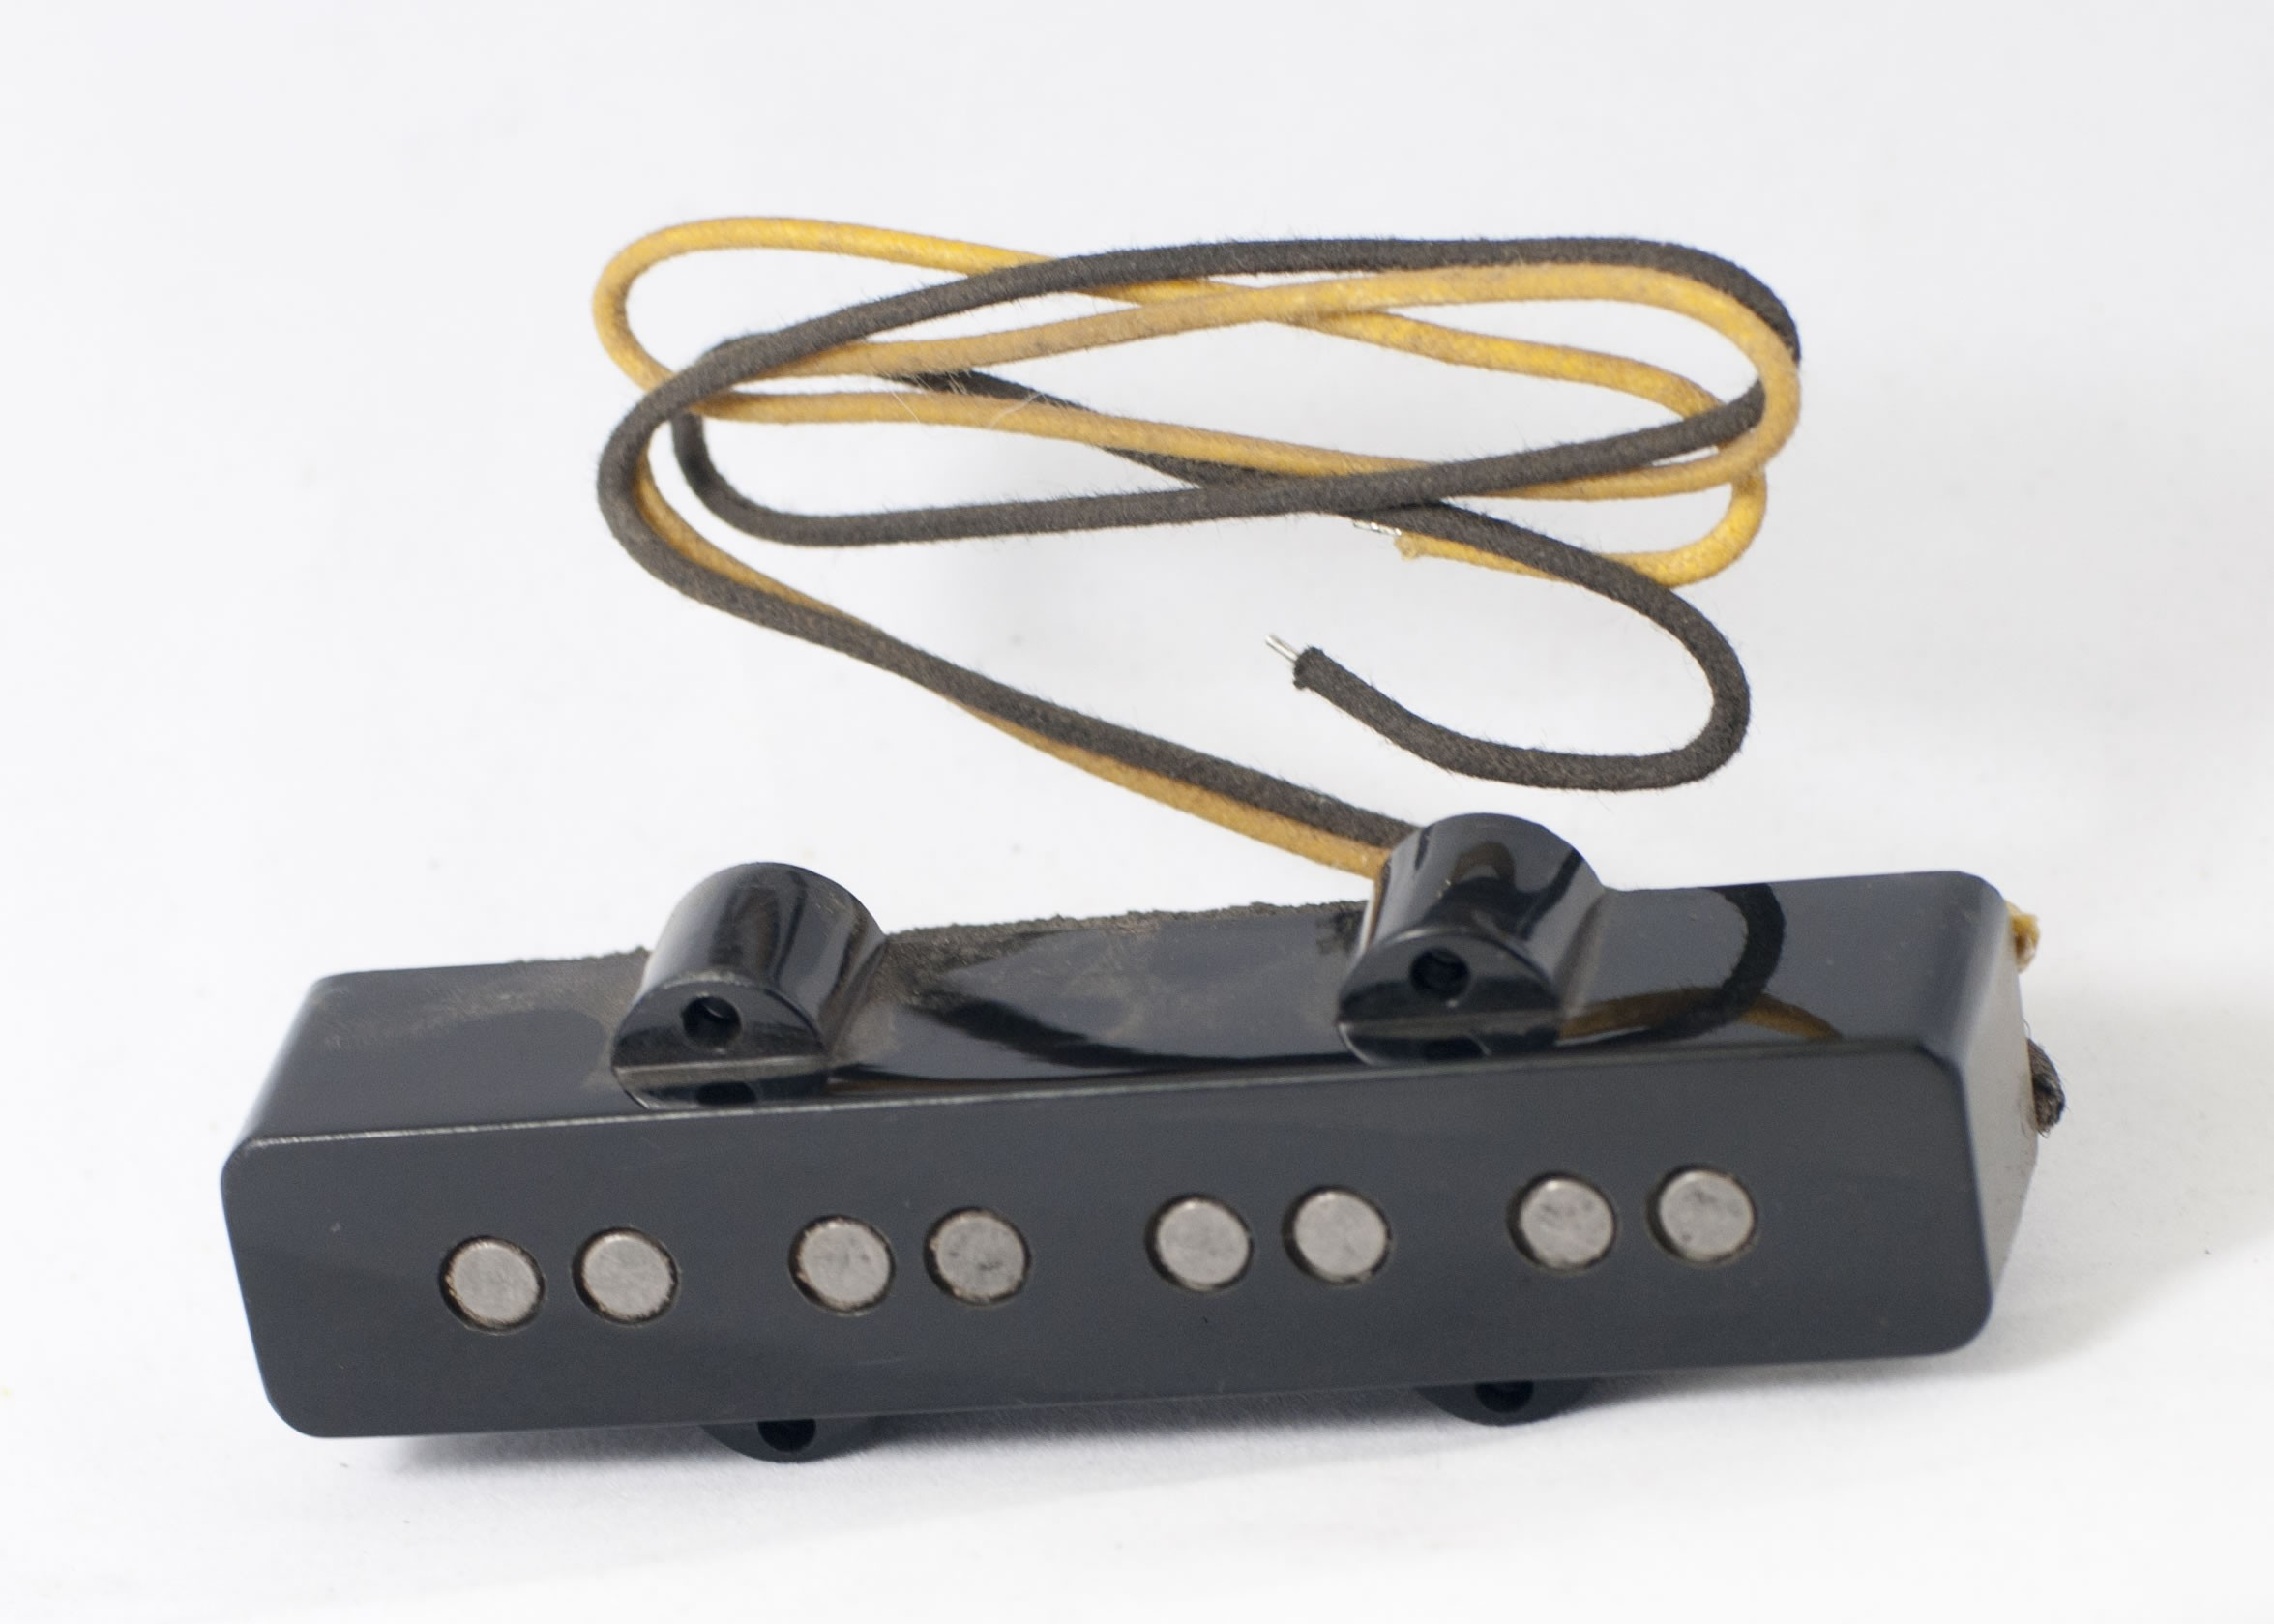 seymour duncan antiquity 2 60 39 s jive 4 string jazz bass pickup neck only best bass gear. Black Bedroom Furniture Sets. Home Design Ideas